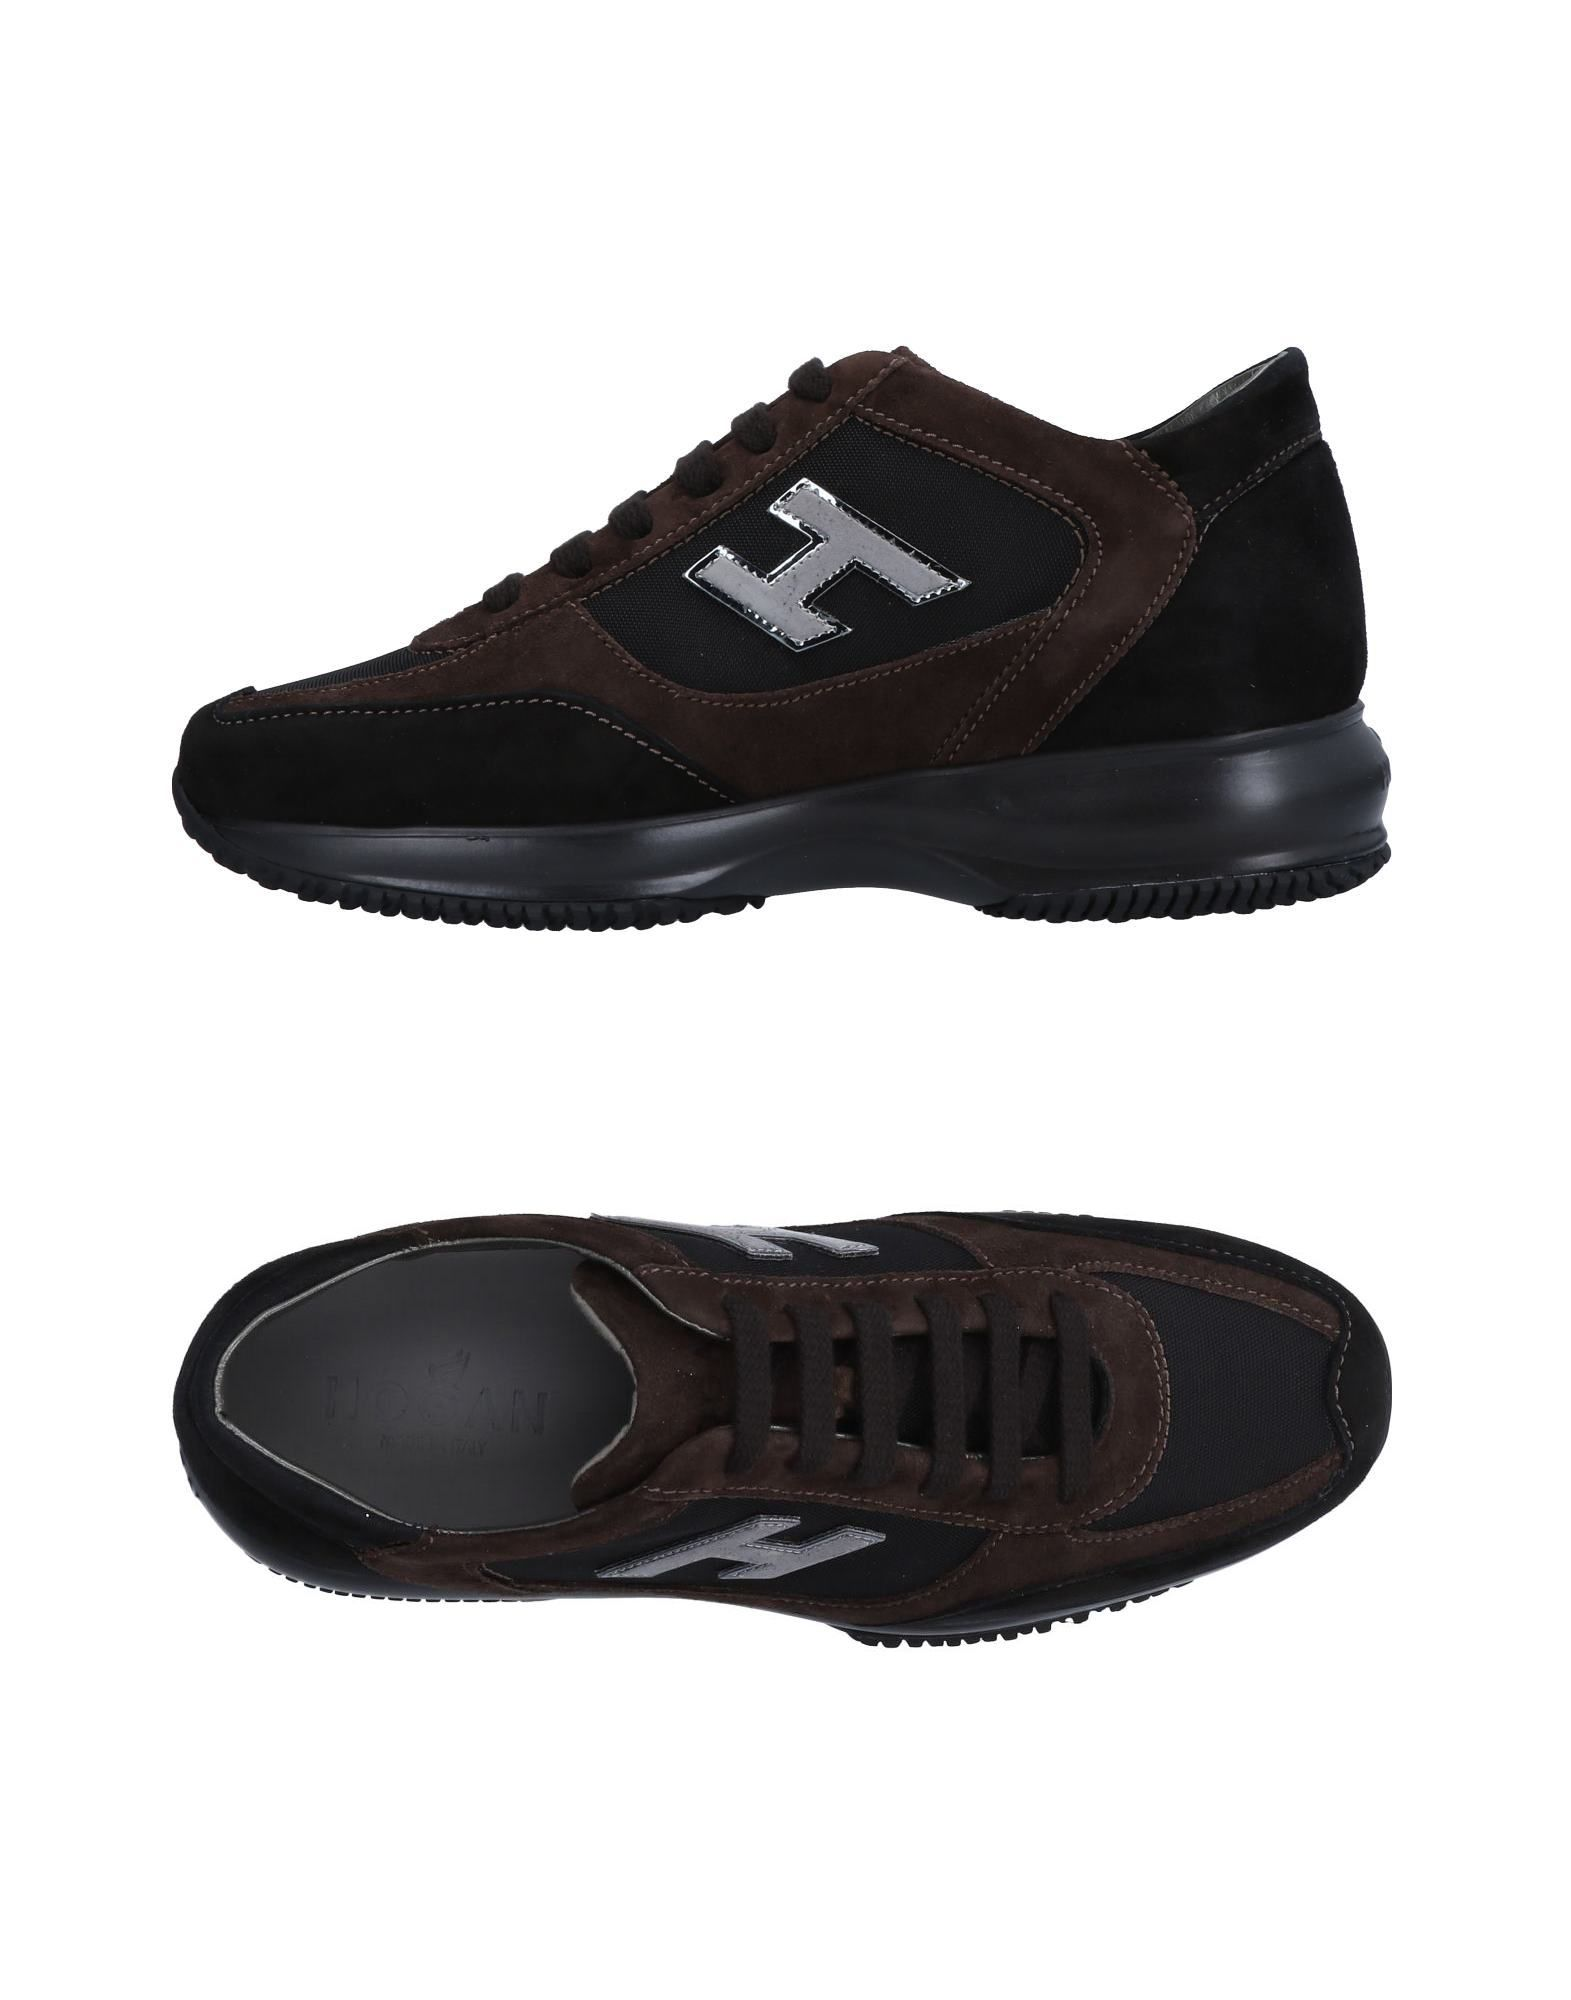 Moda Sneakers Sneakers Moda Hogan Donna - 11517341JL c3e7b5